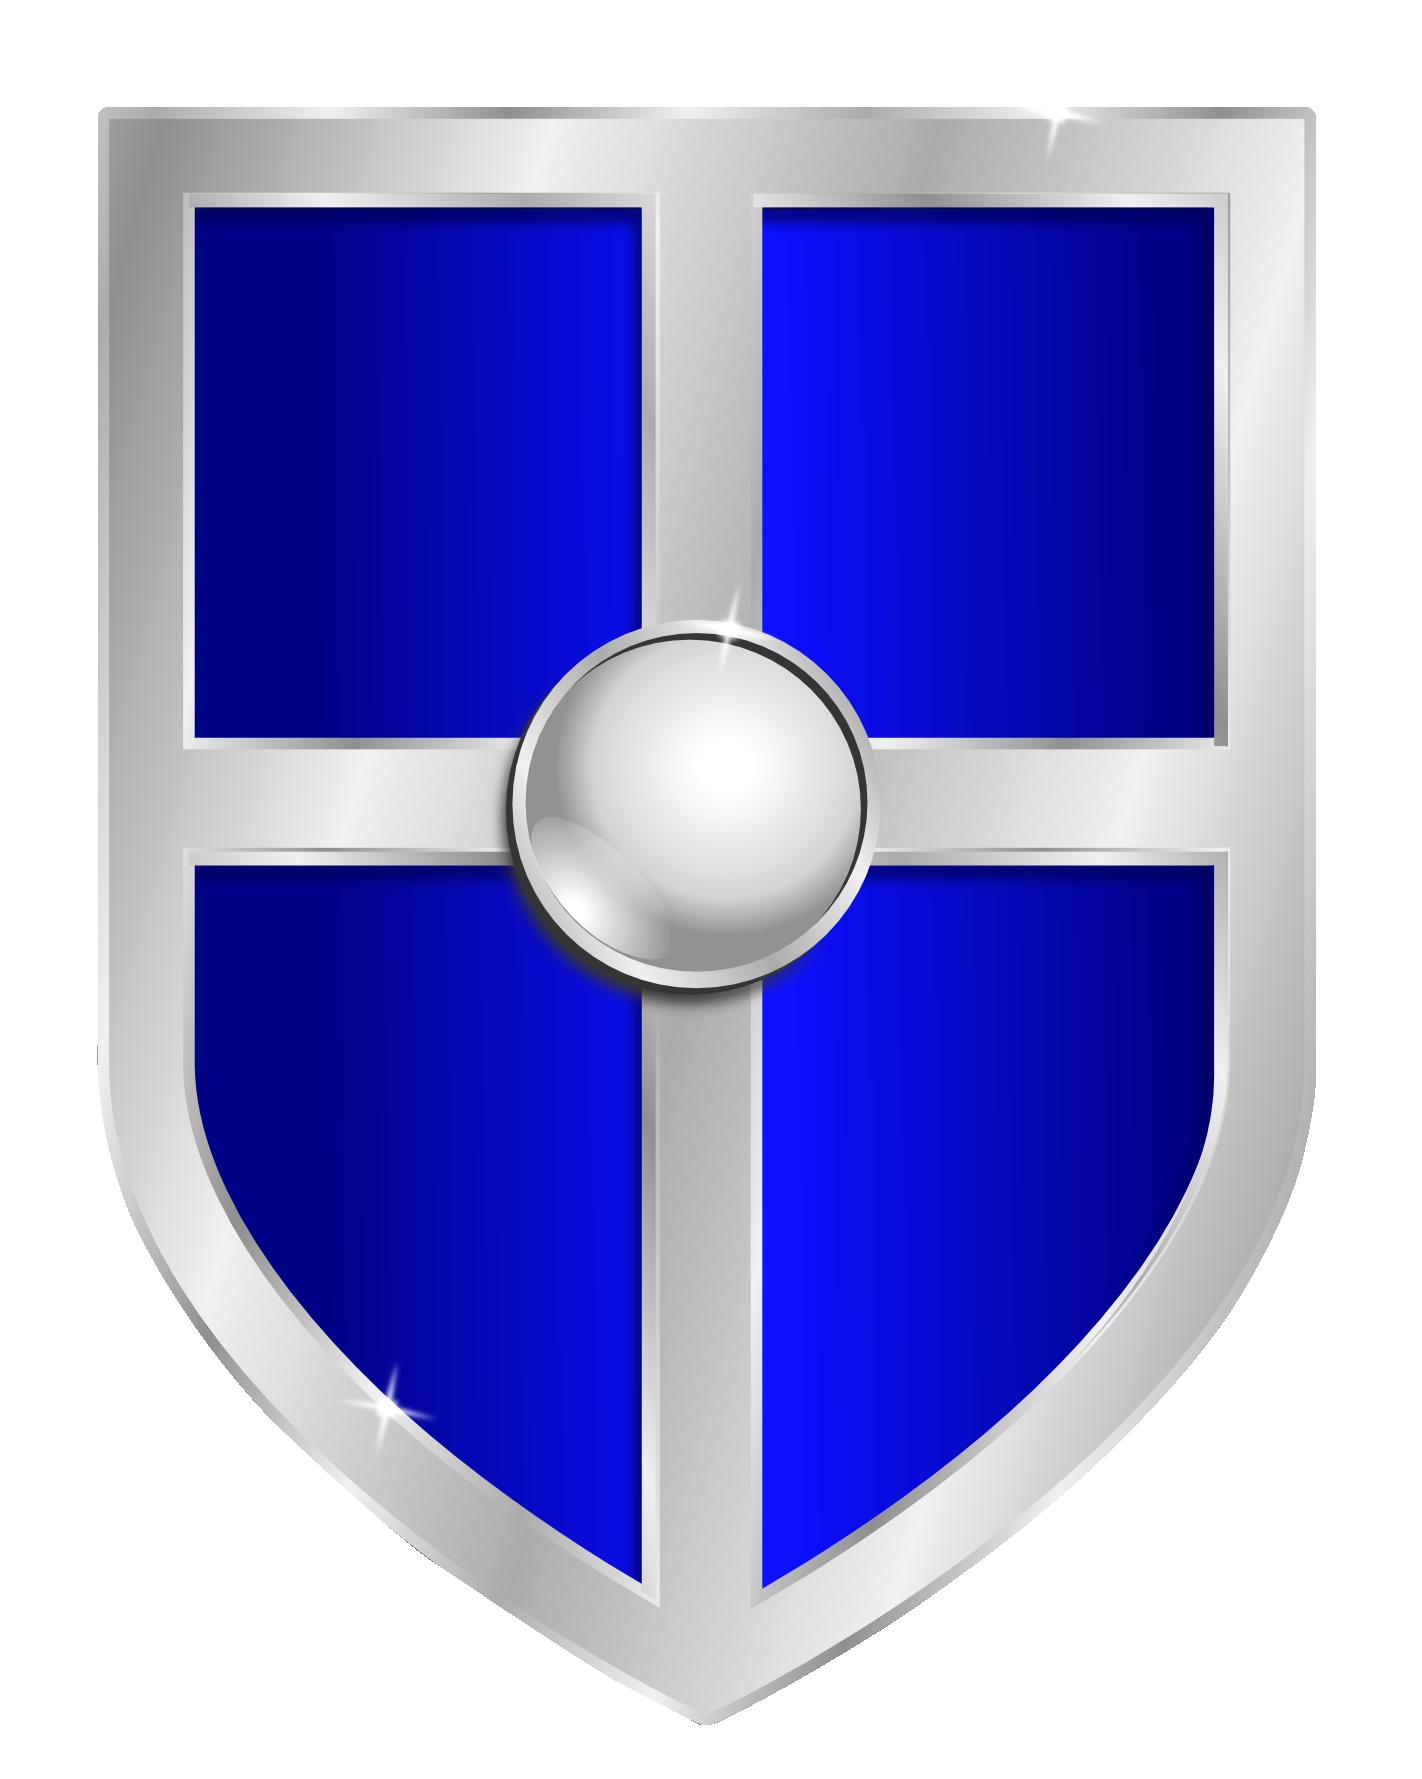 Clipart shield protection shield. Png transparent image pngpix